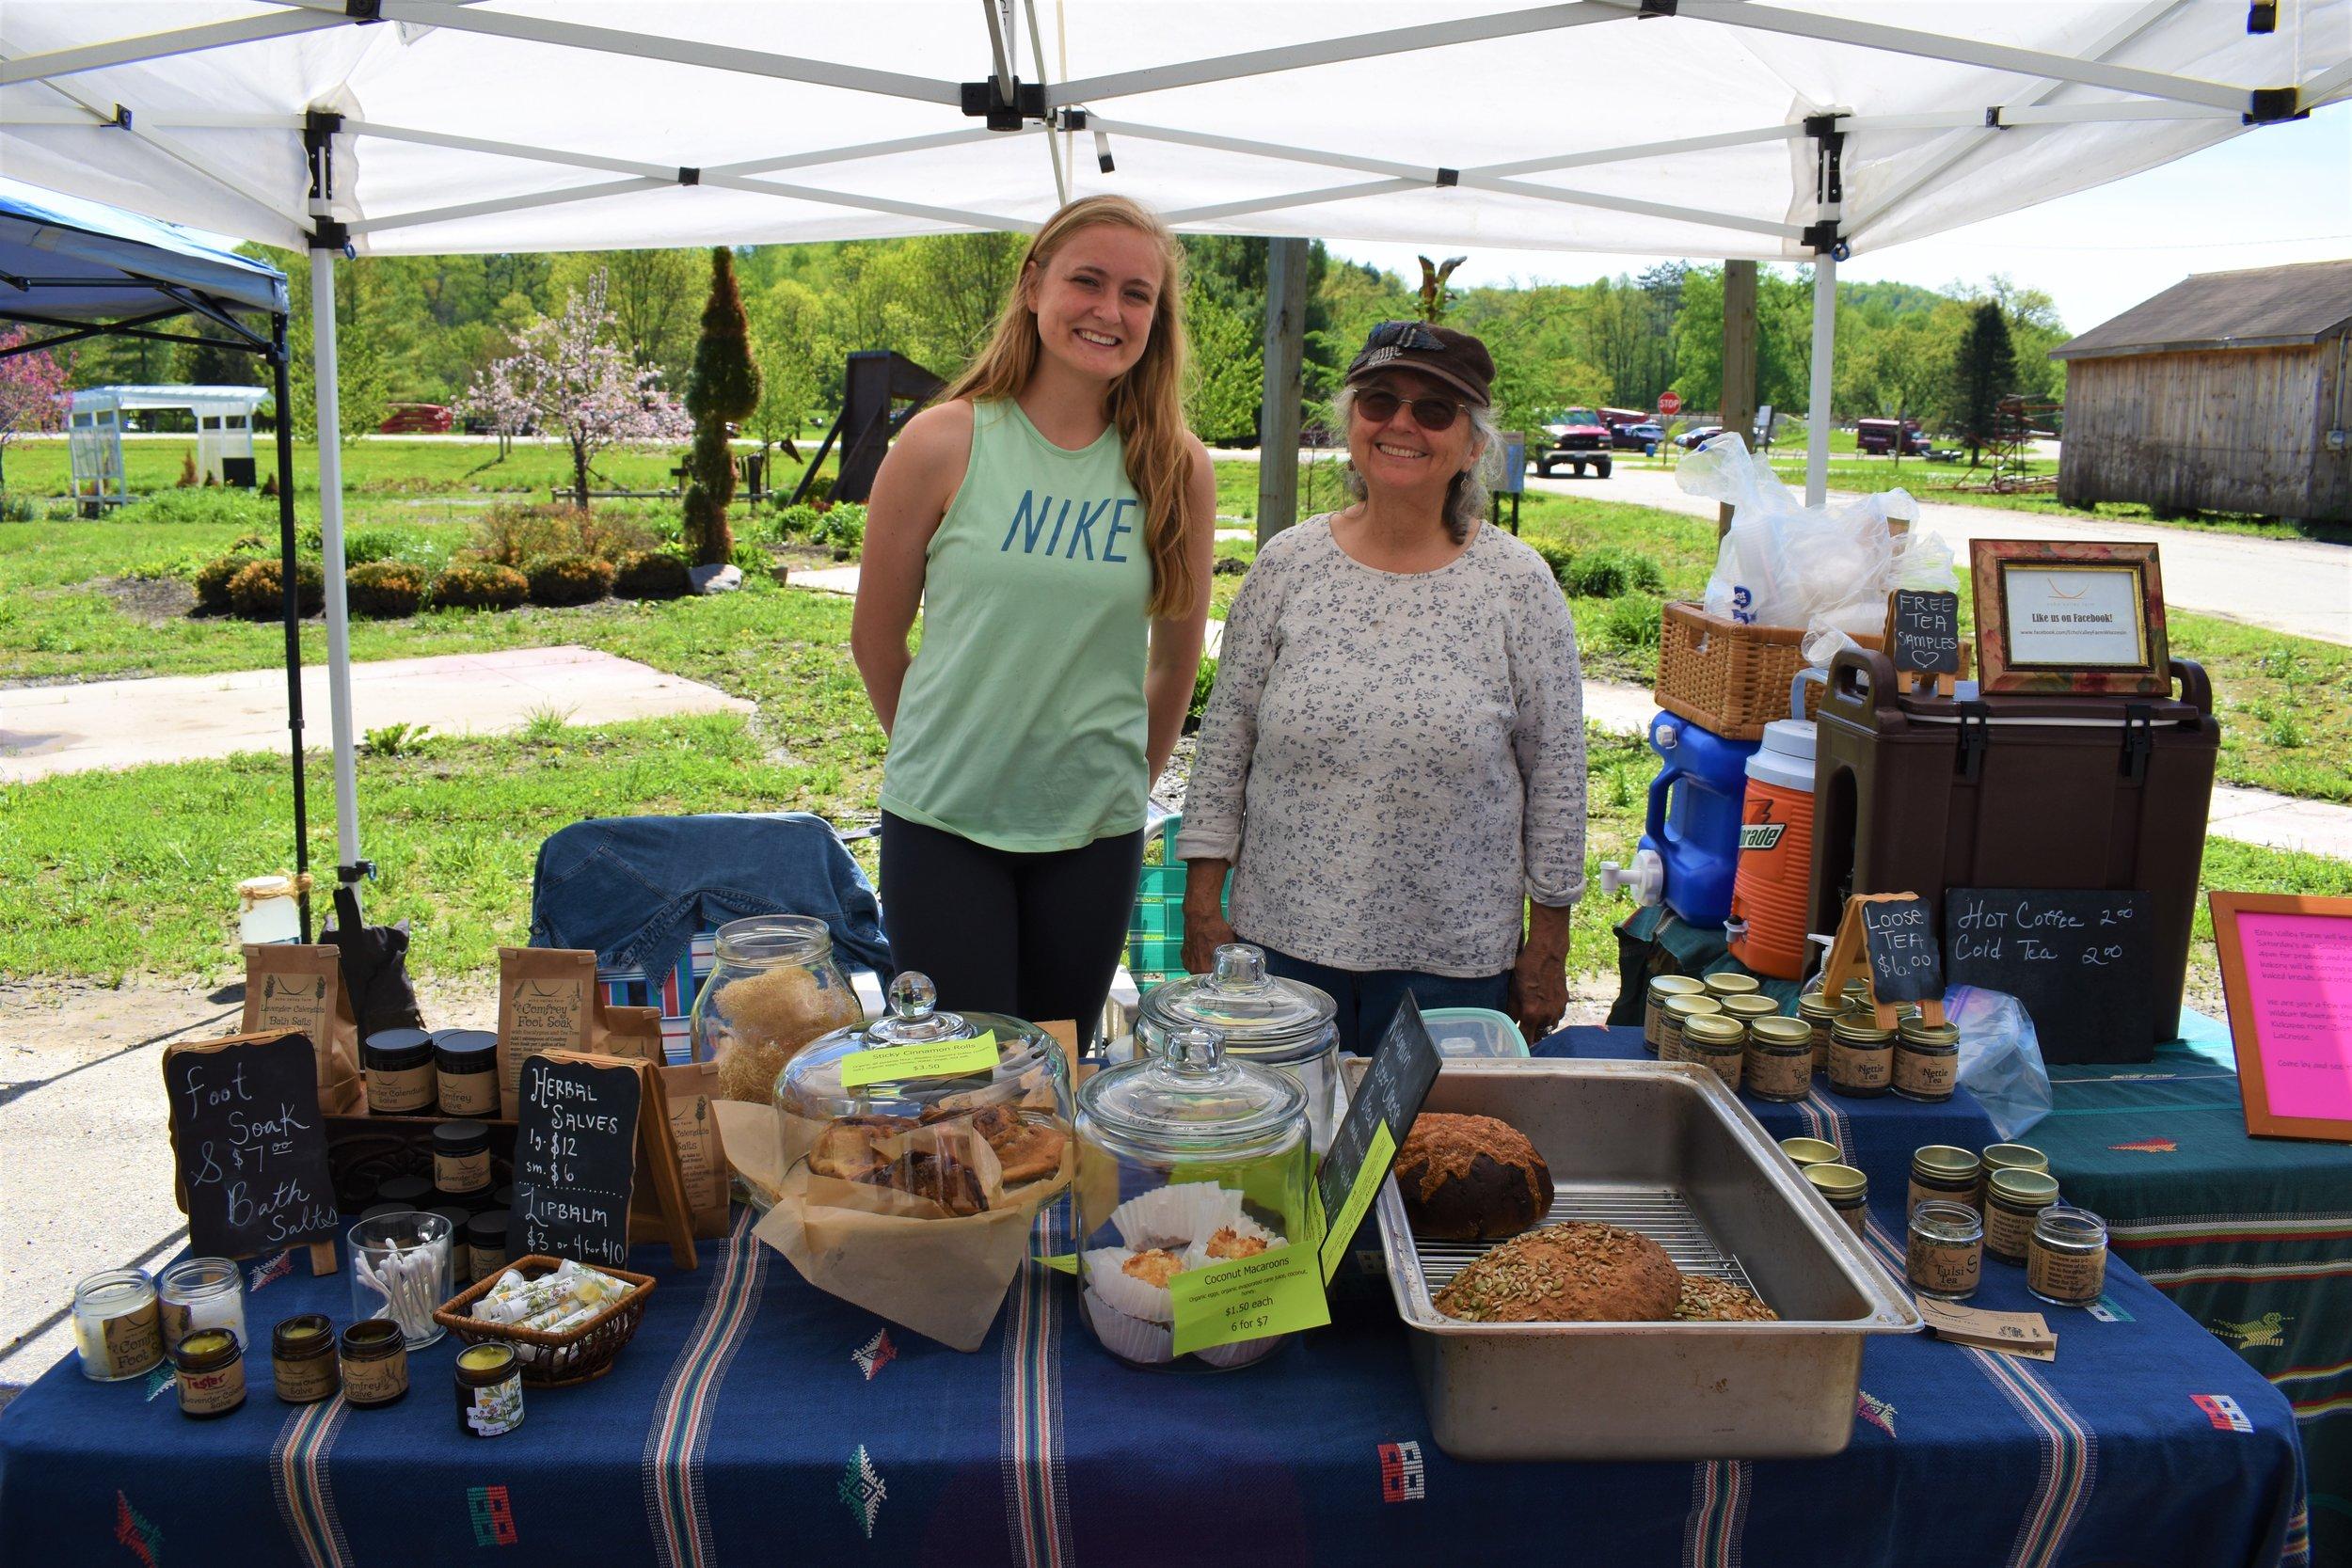 L to R- Jennifer Boyle and Deb Hiltz of Echo Valley Farm Ontario, WI.